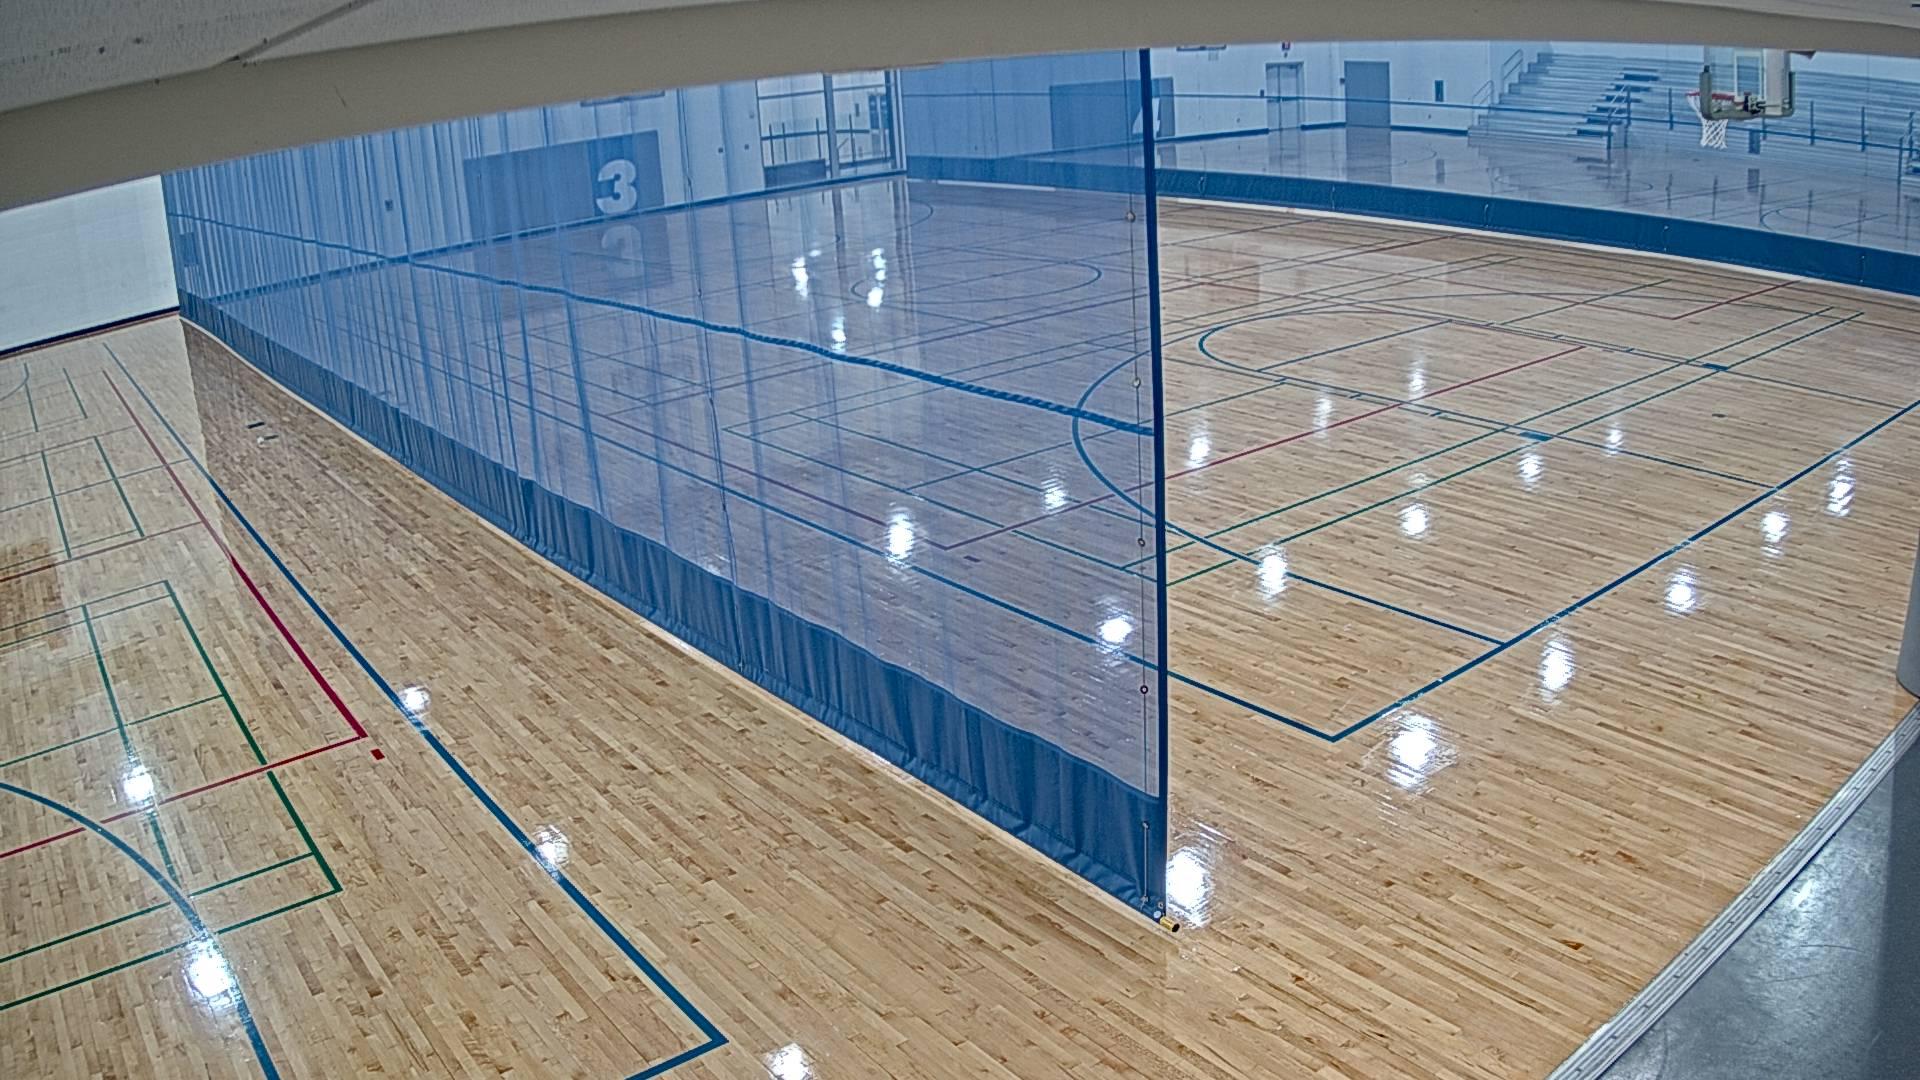 SWRC Courts 3-4